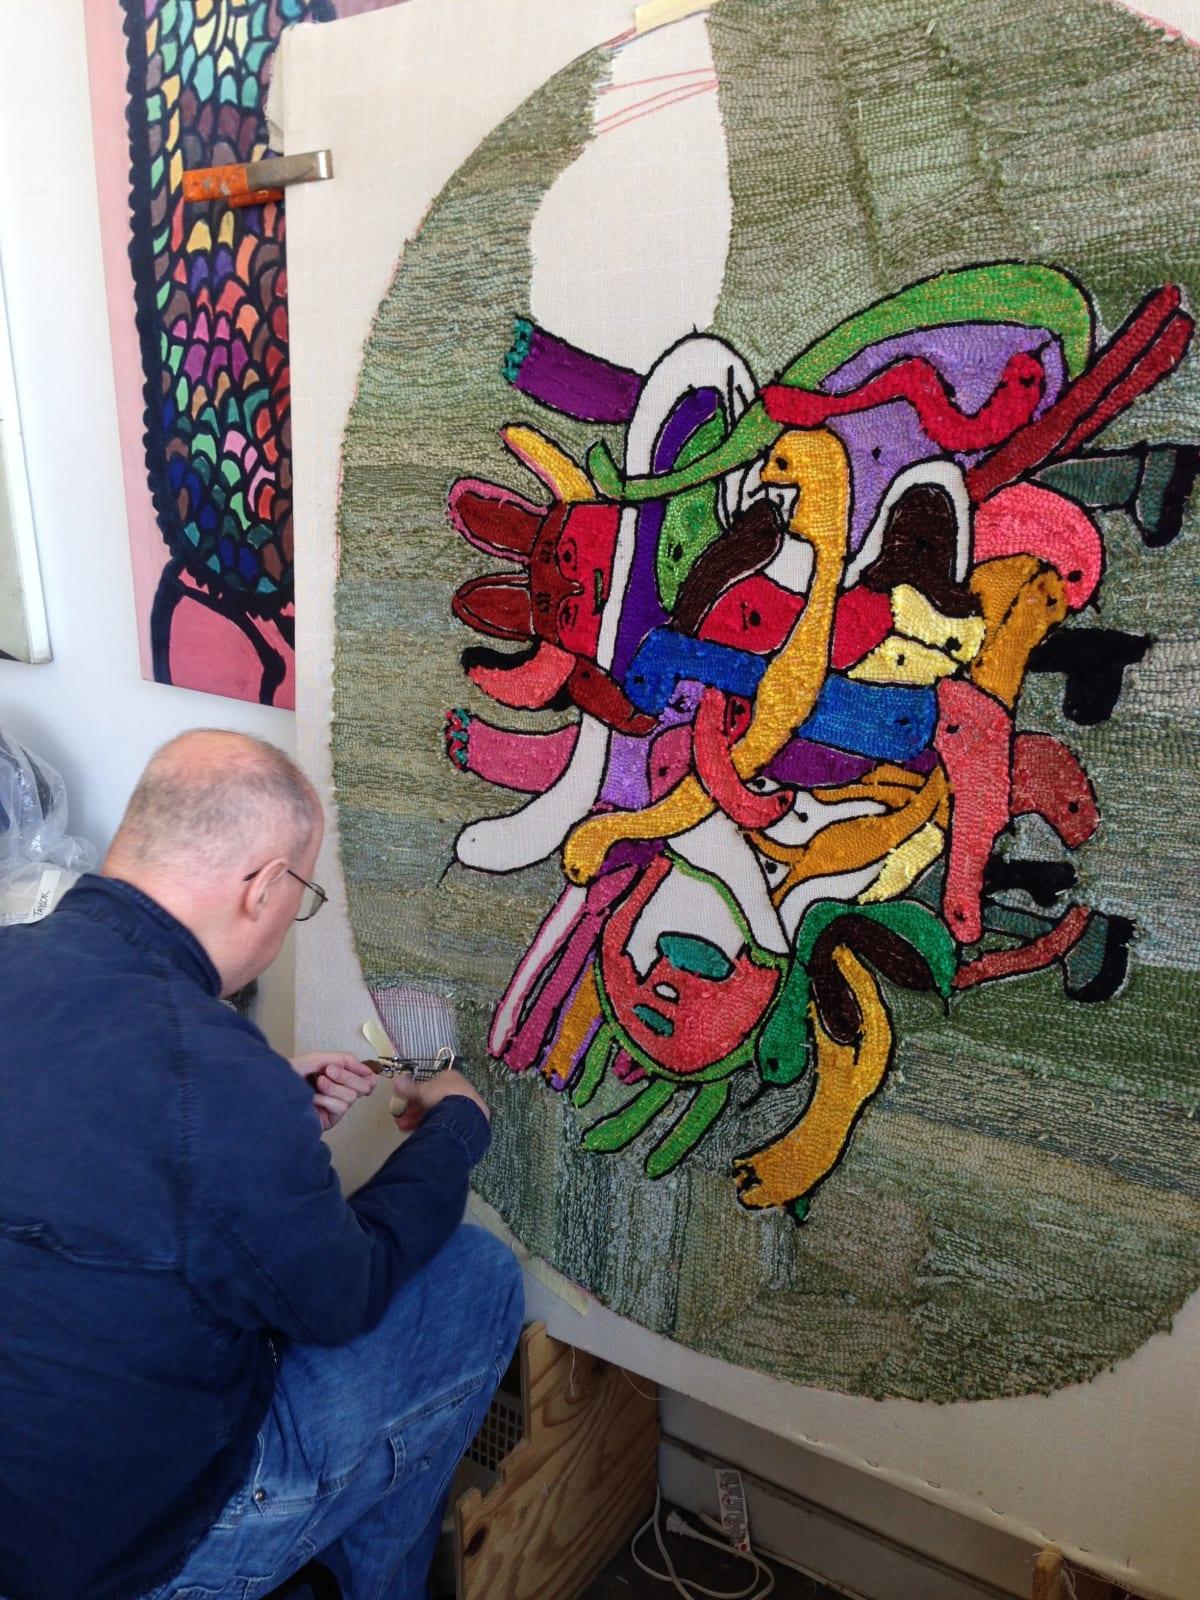 Artist William Tyler works on a rug designed by Creative Growth alum Merritt Wallace.